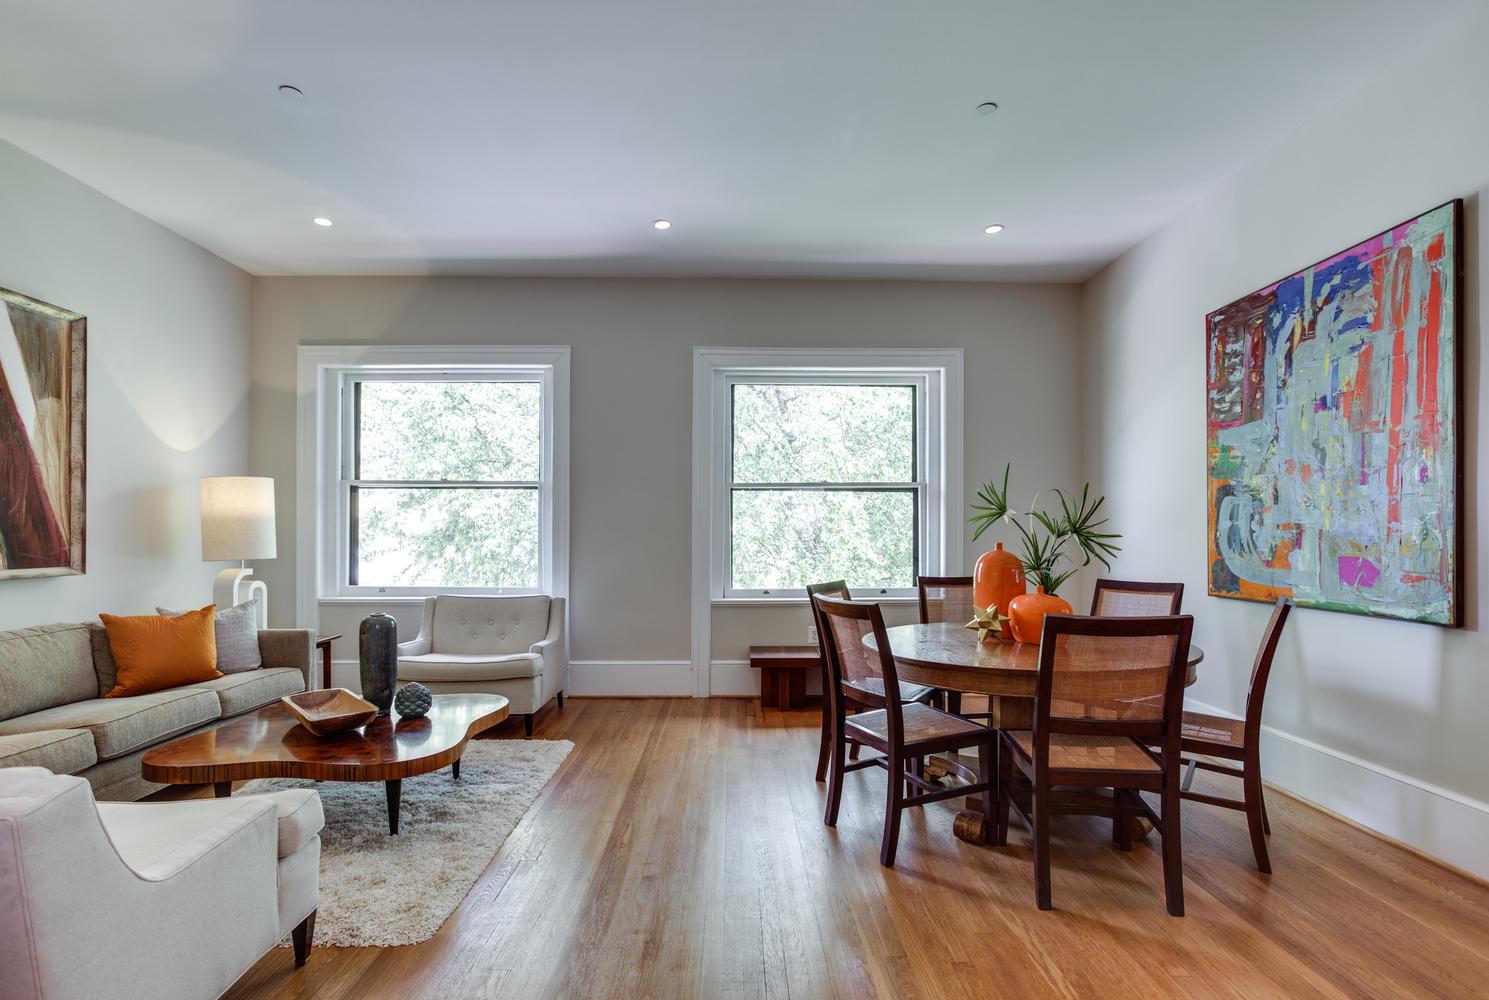 1632 16th St NW Unit 32-large-008-8-LivingDining Room-1489x1000-72dpi.jpg